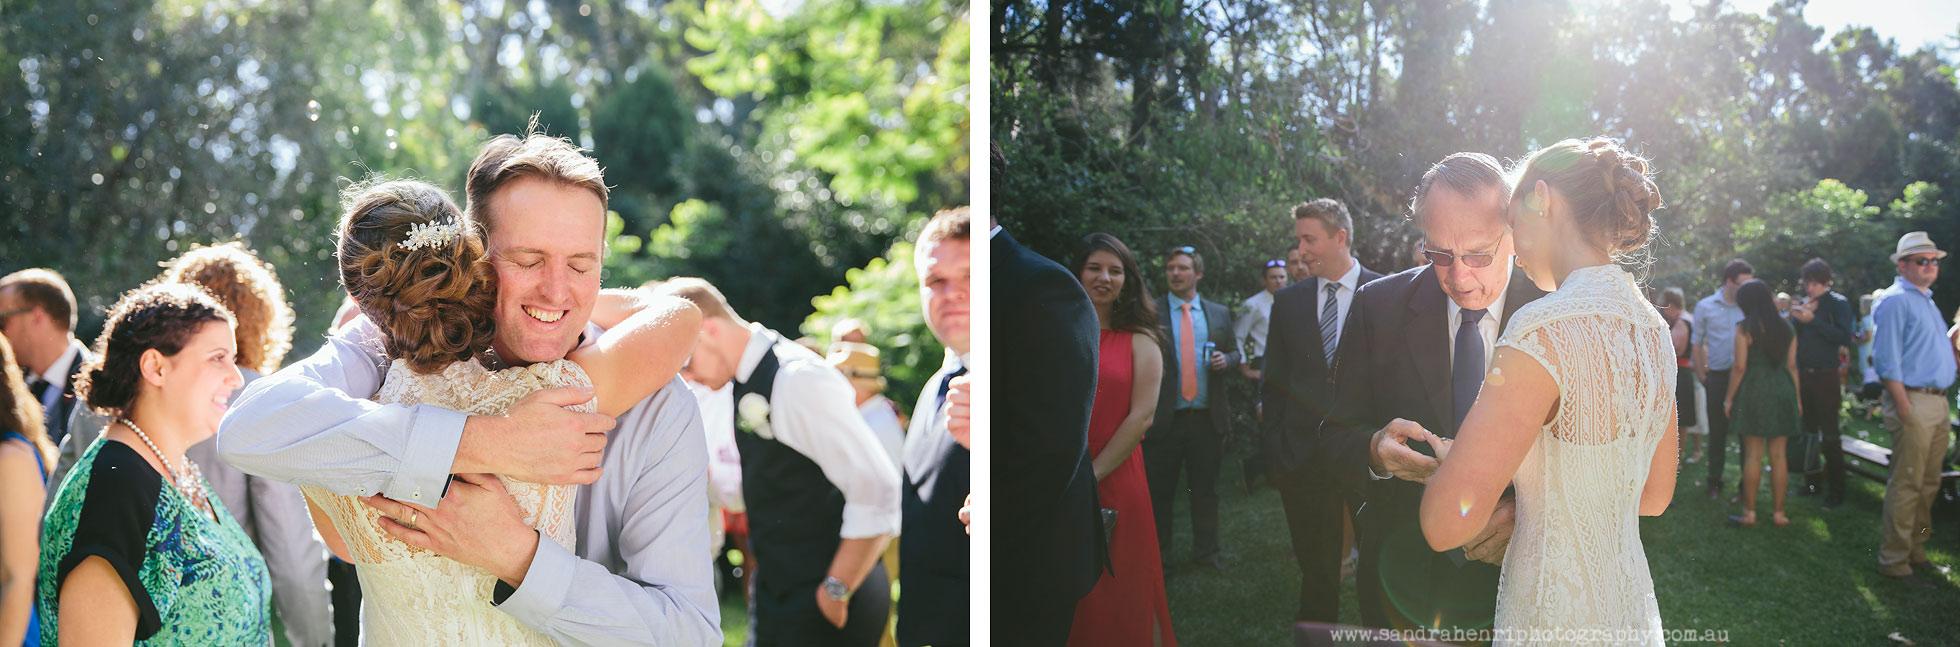 Port-Stephens-Wedding-Photographer-Central-Coast-23.jpg